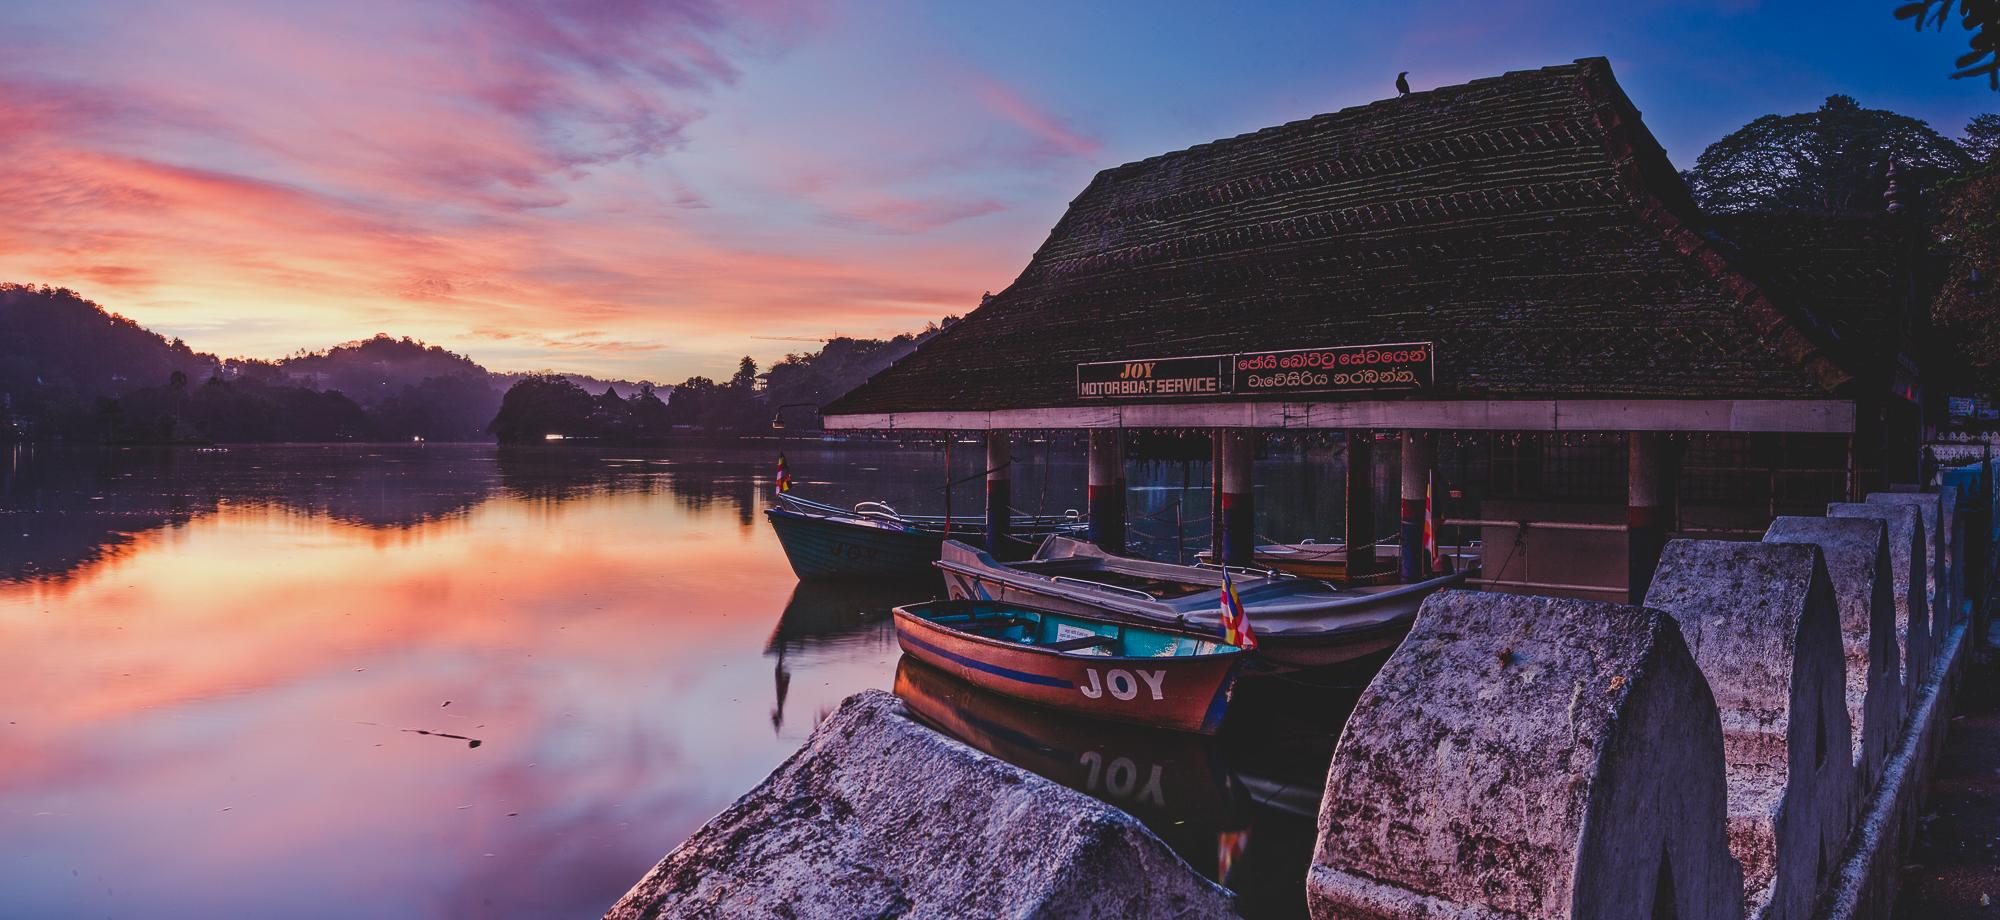 Kandy lake at sunrise